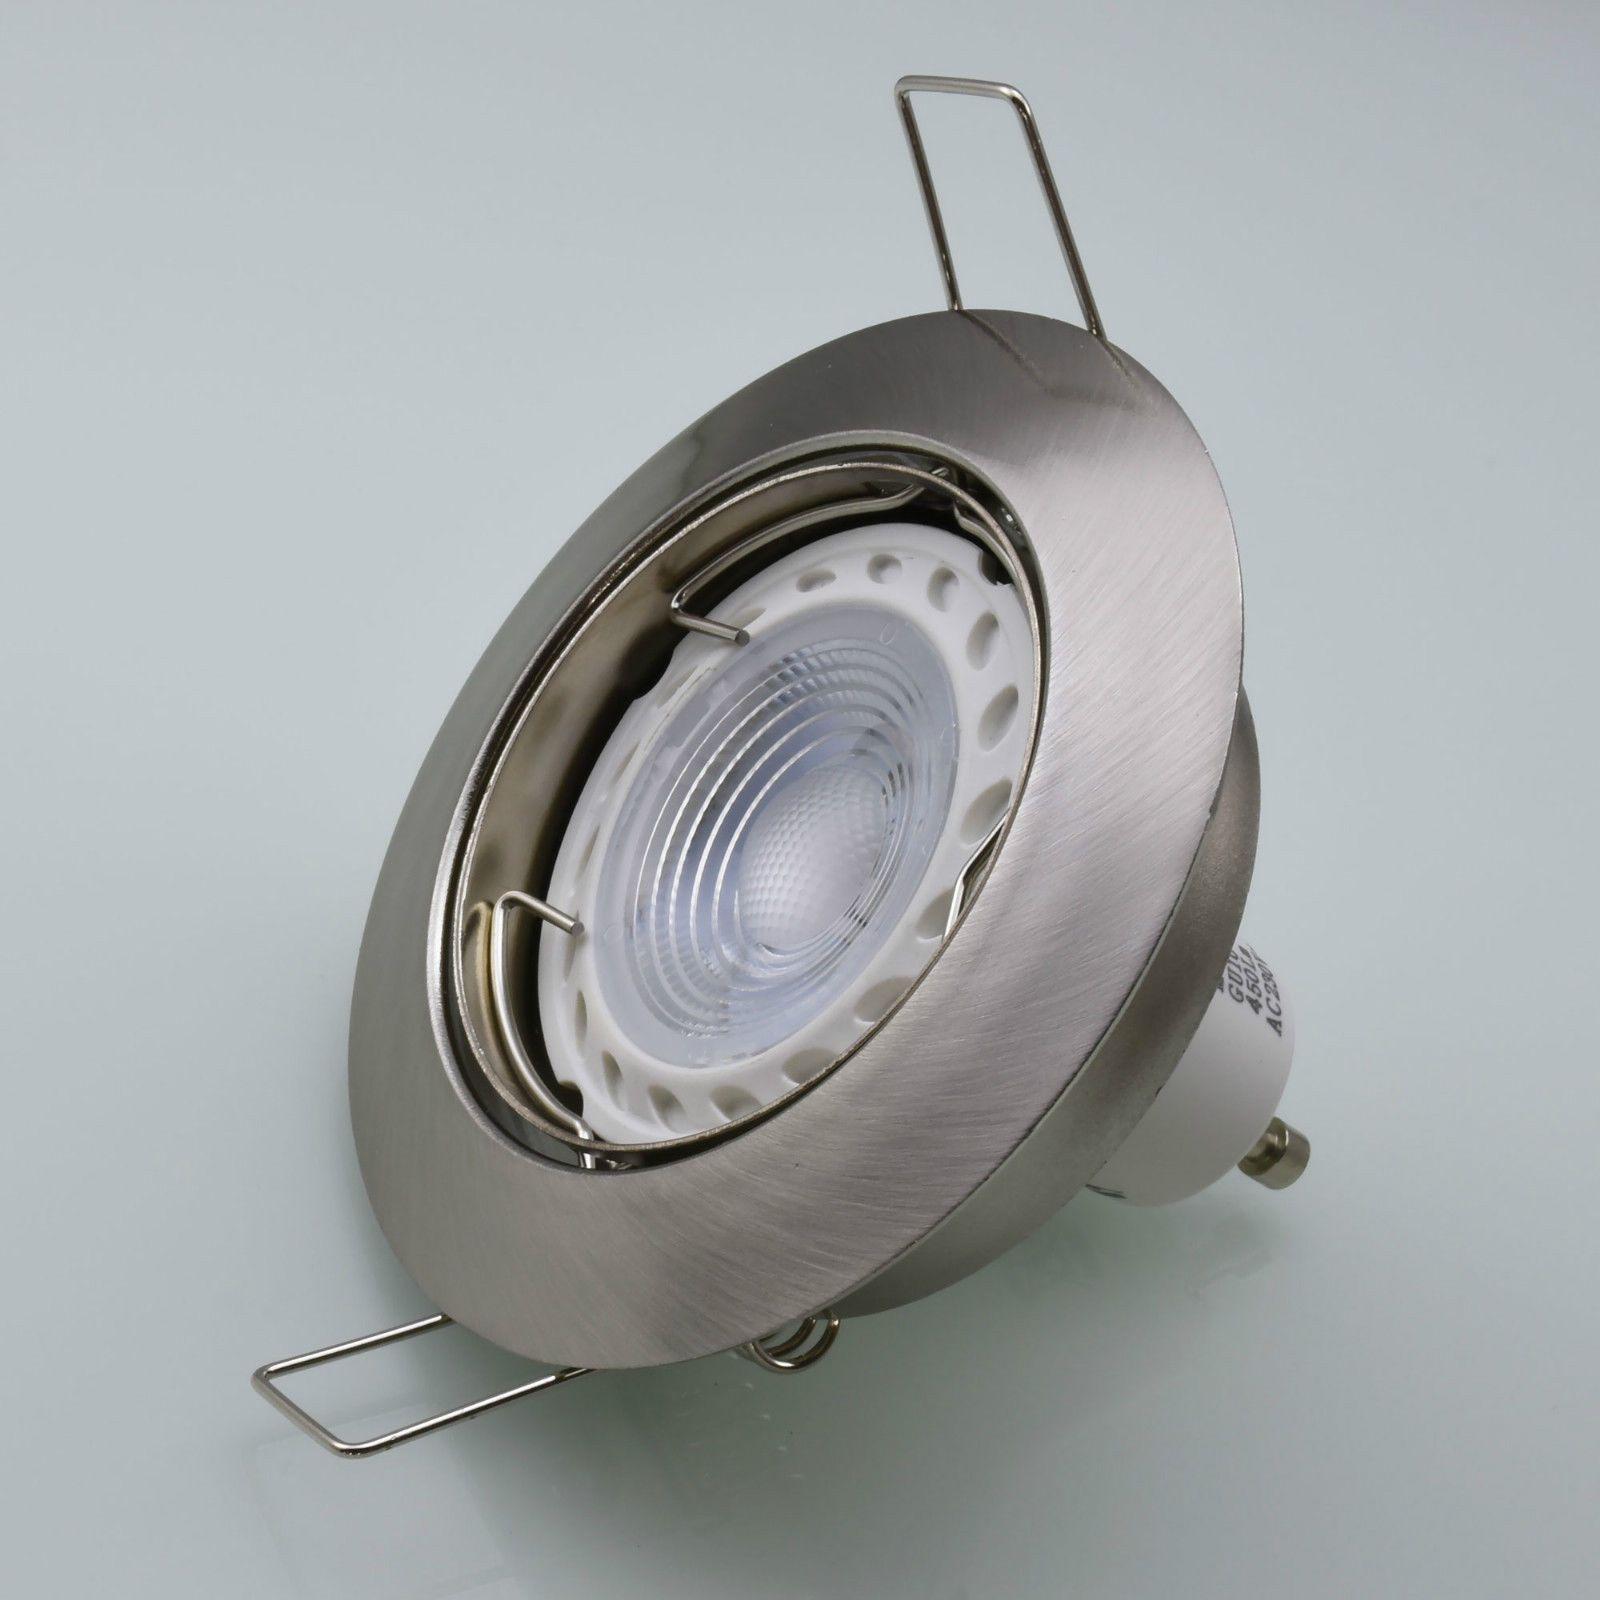 Einbaustrahler Einbauspot Spot 104S-TP LED 7W Einbauleuchte Lampe Strahler | eBay